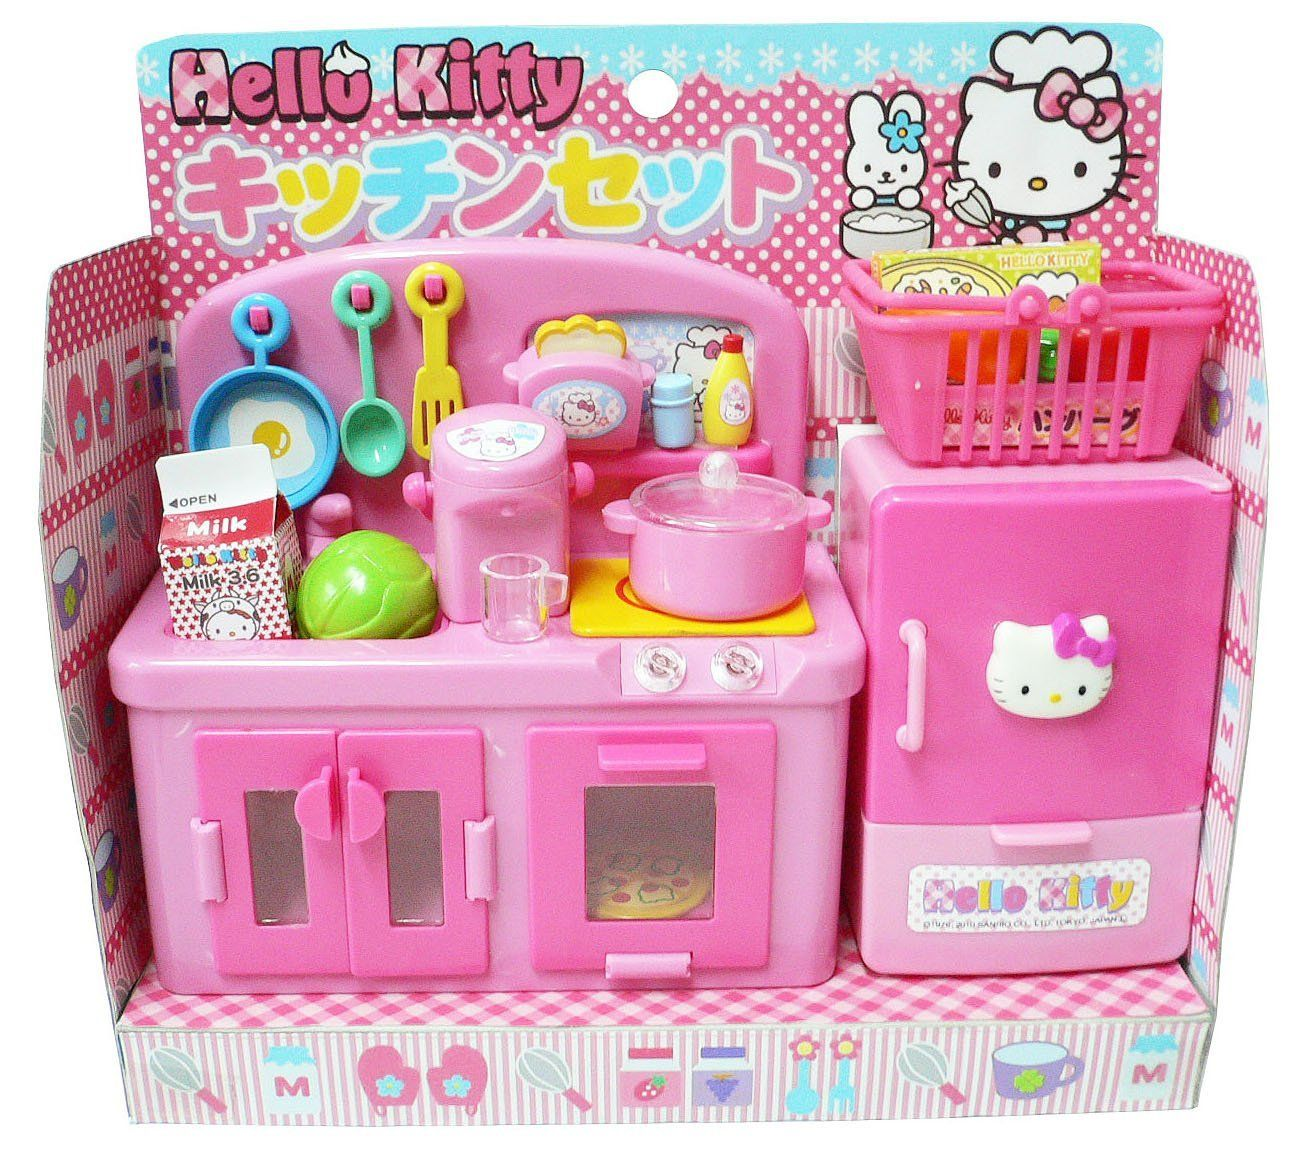 Hello Kitty Kitchen Play Set Miniature Toy